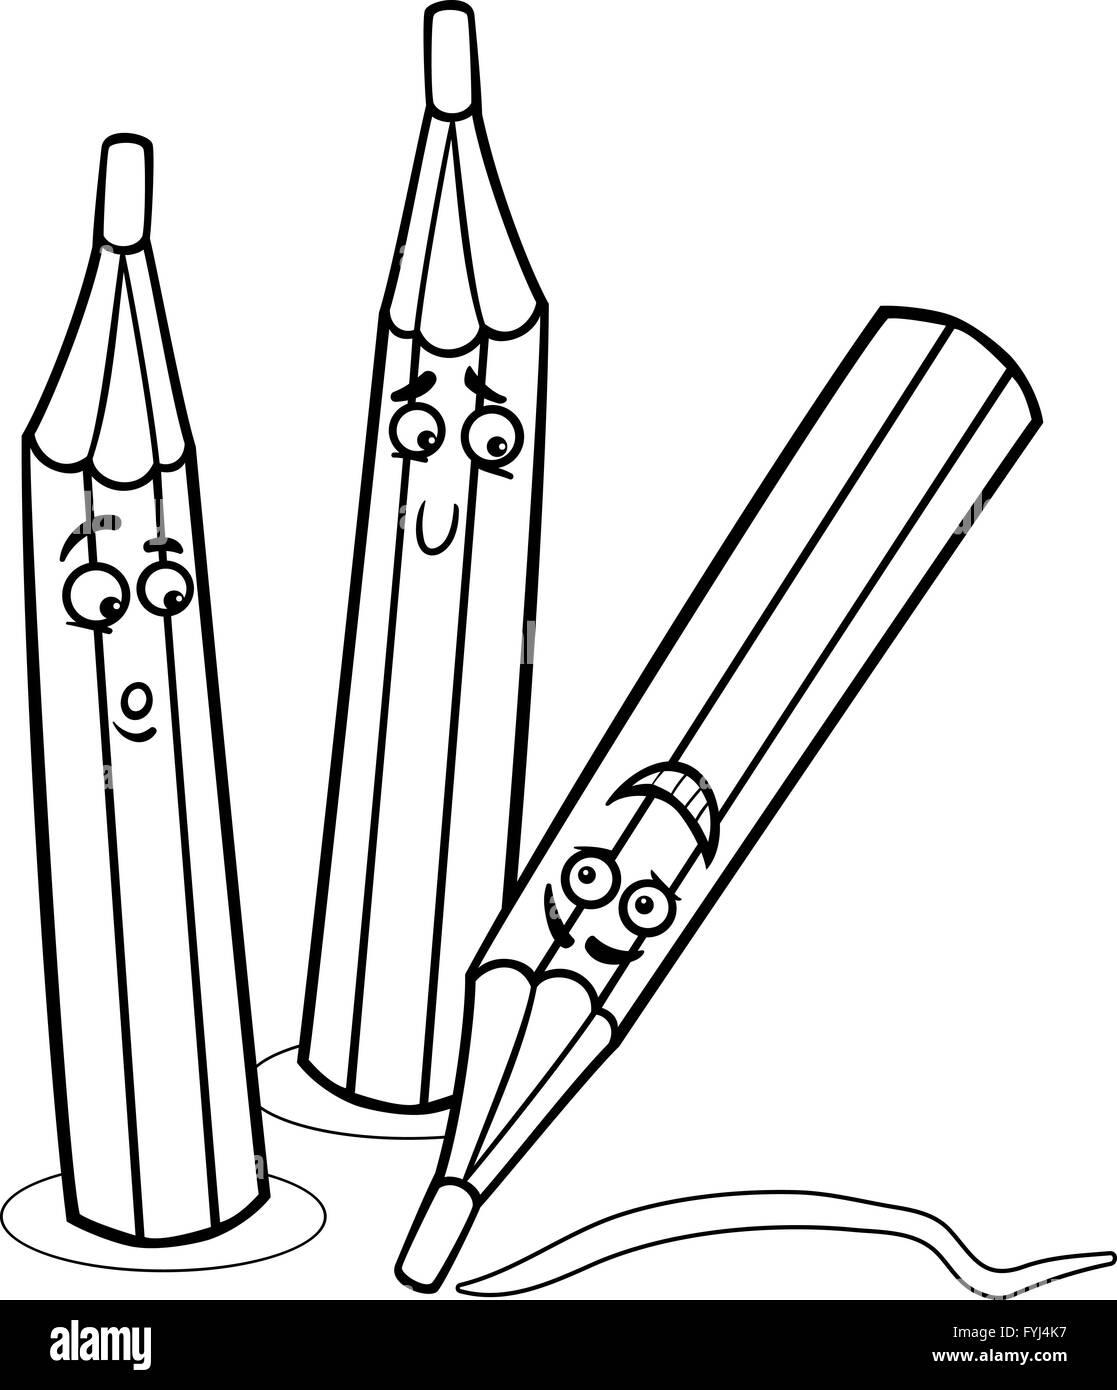 Moderno Colorear Crayón Azul Para Colorear Fotos - Dibujos Para ...